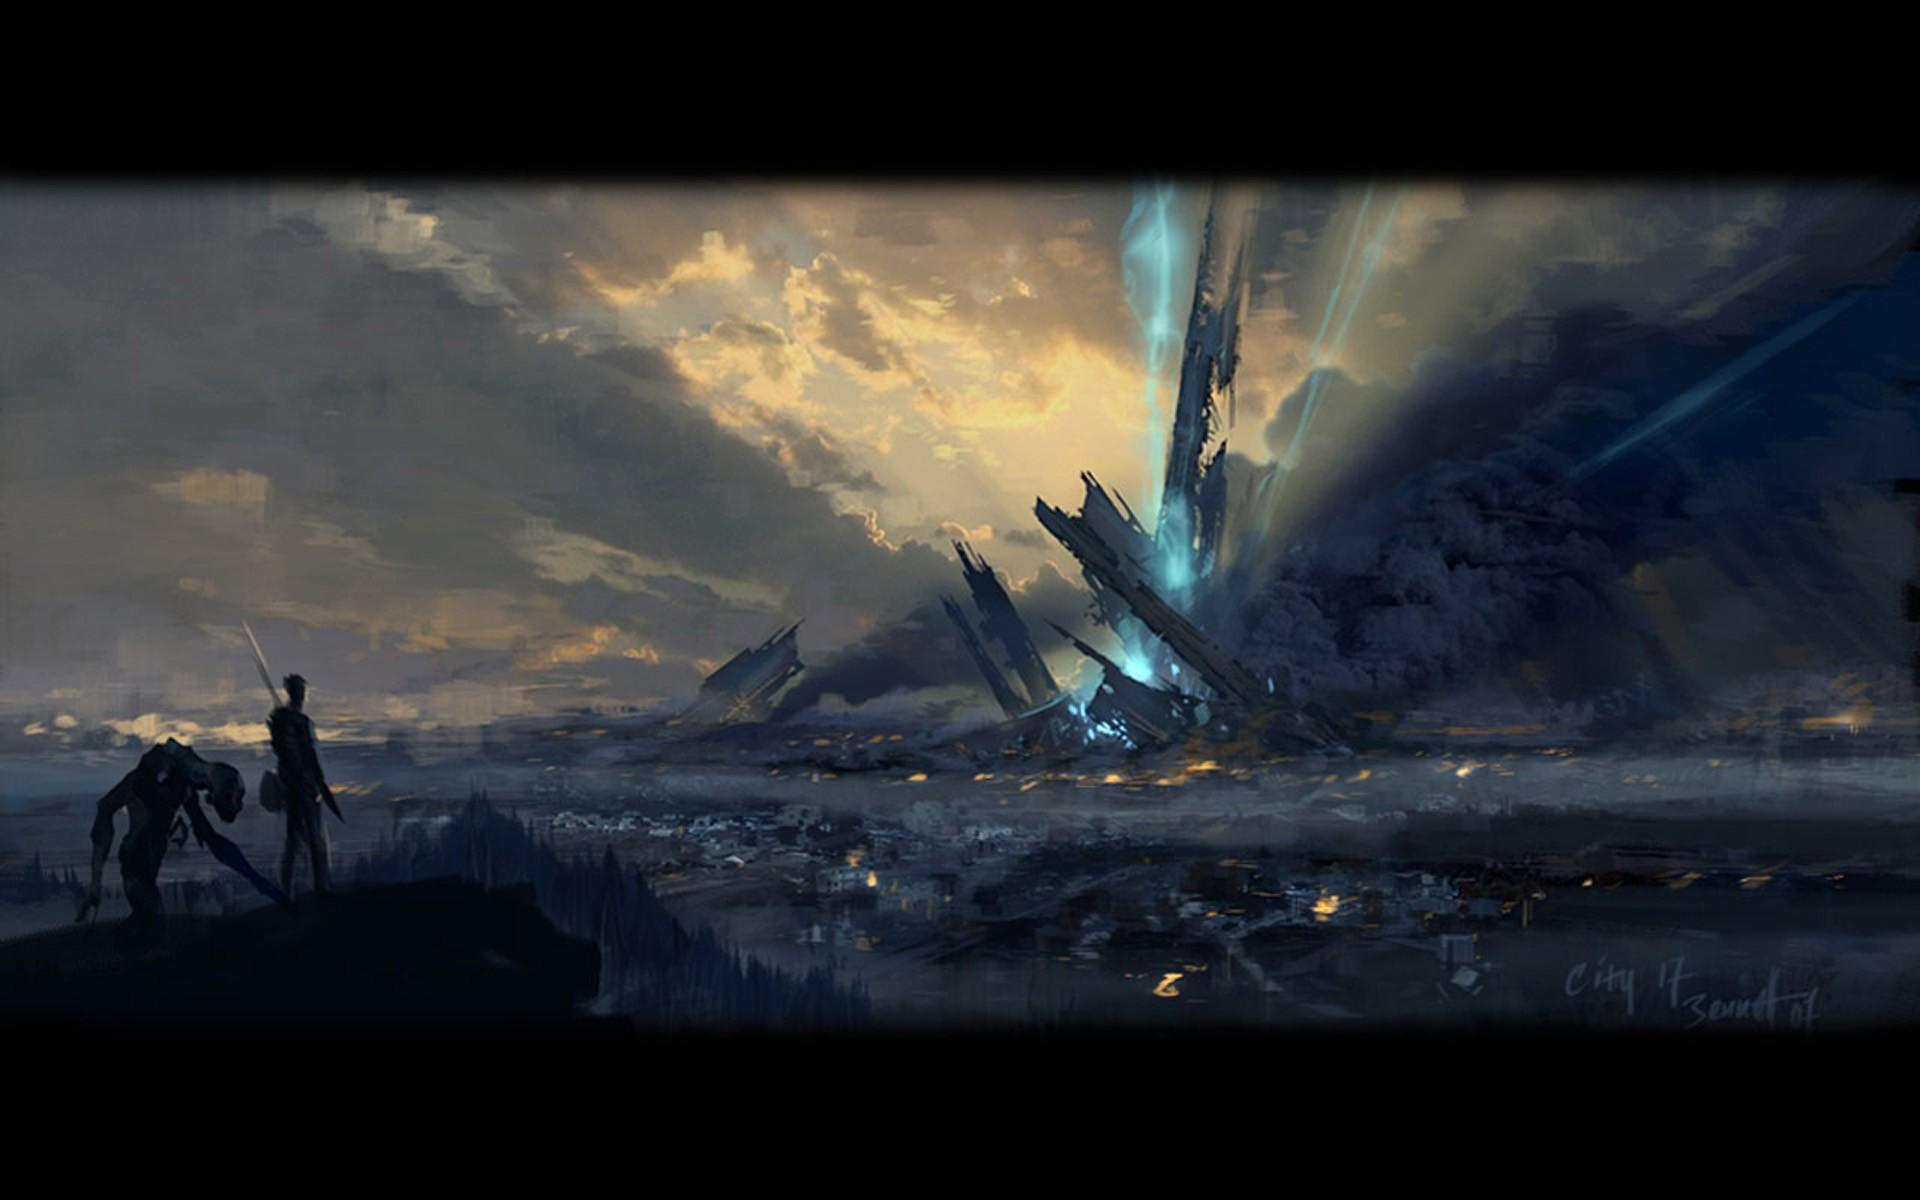 Half Life 2 Wallpaper ·① Download Free Beautiful Full HD